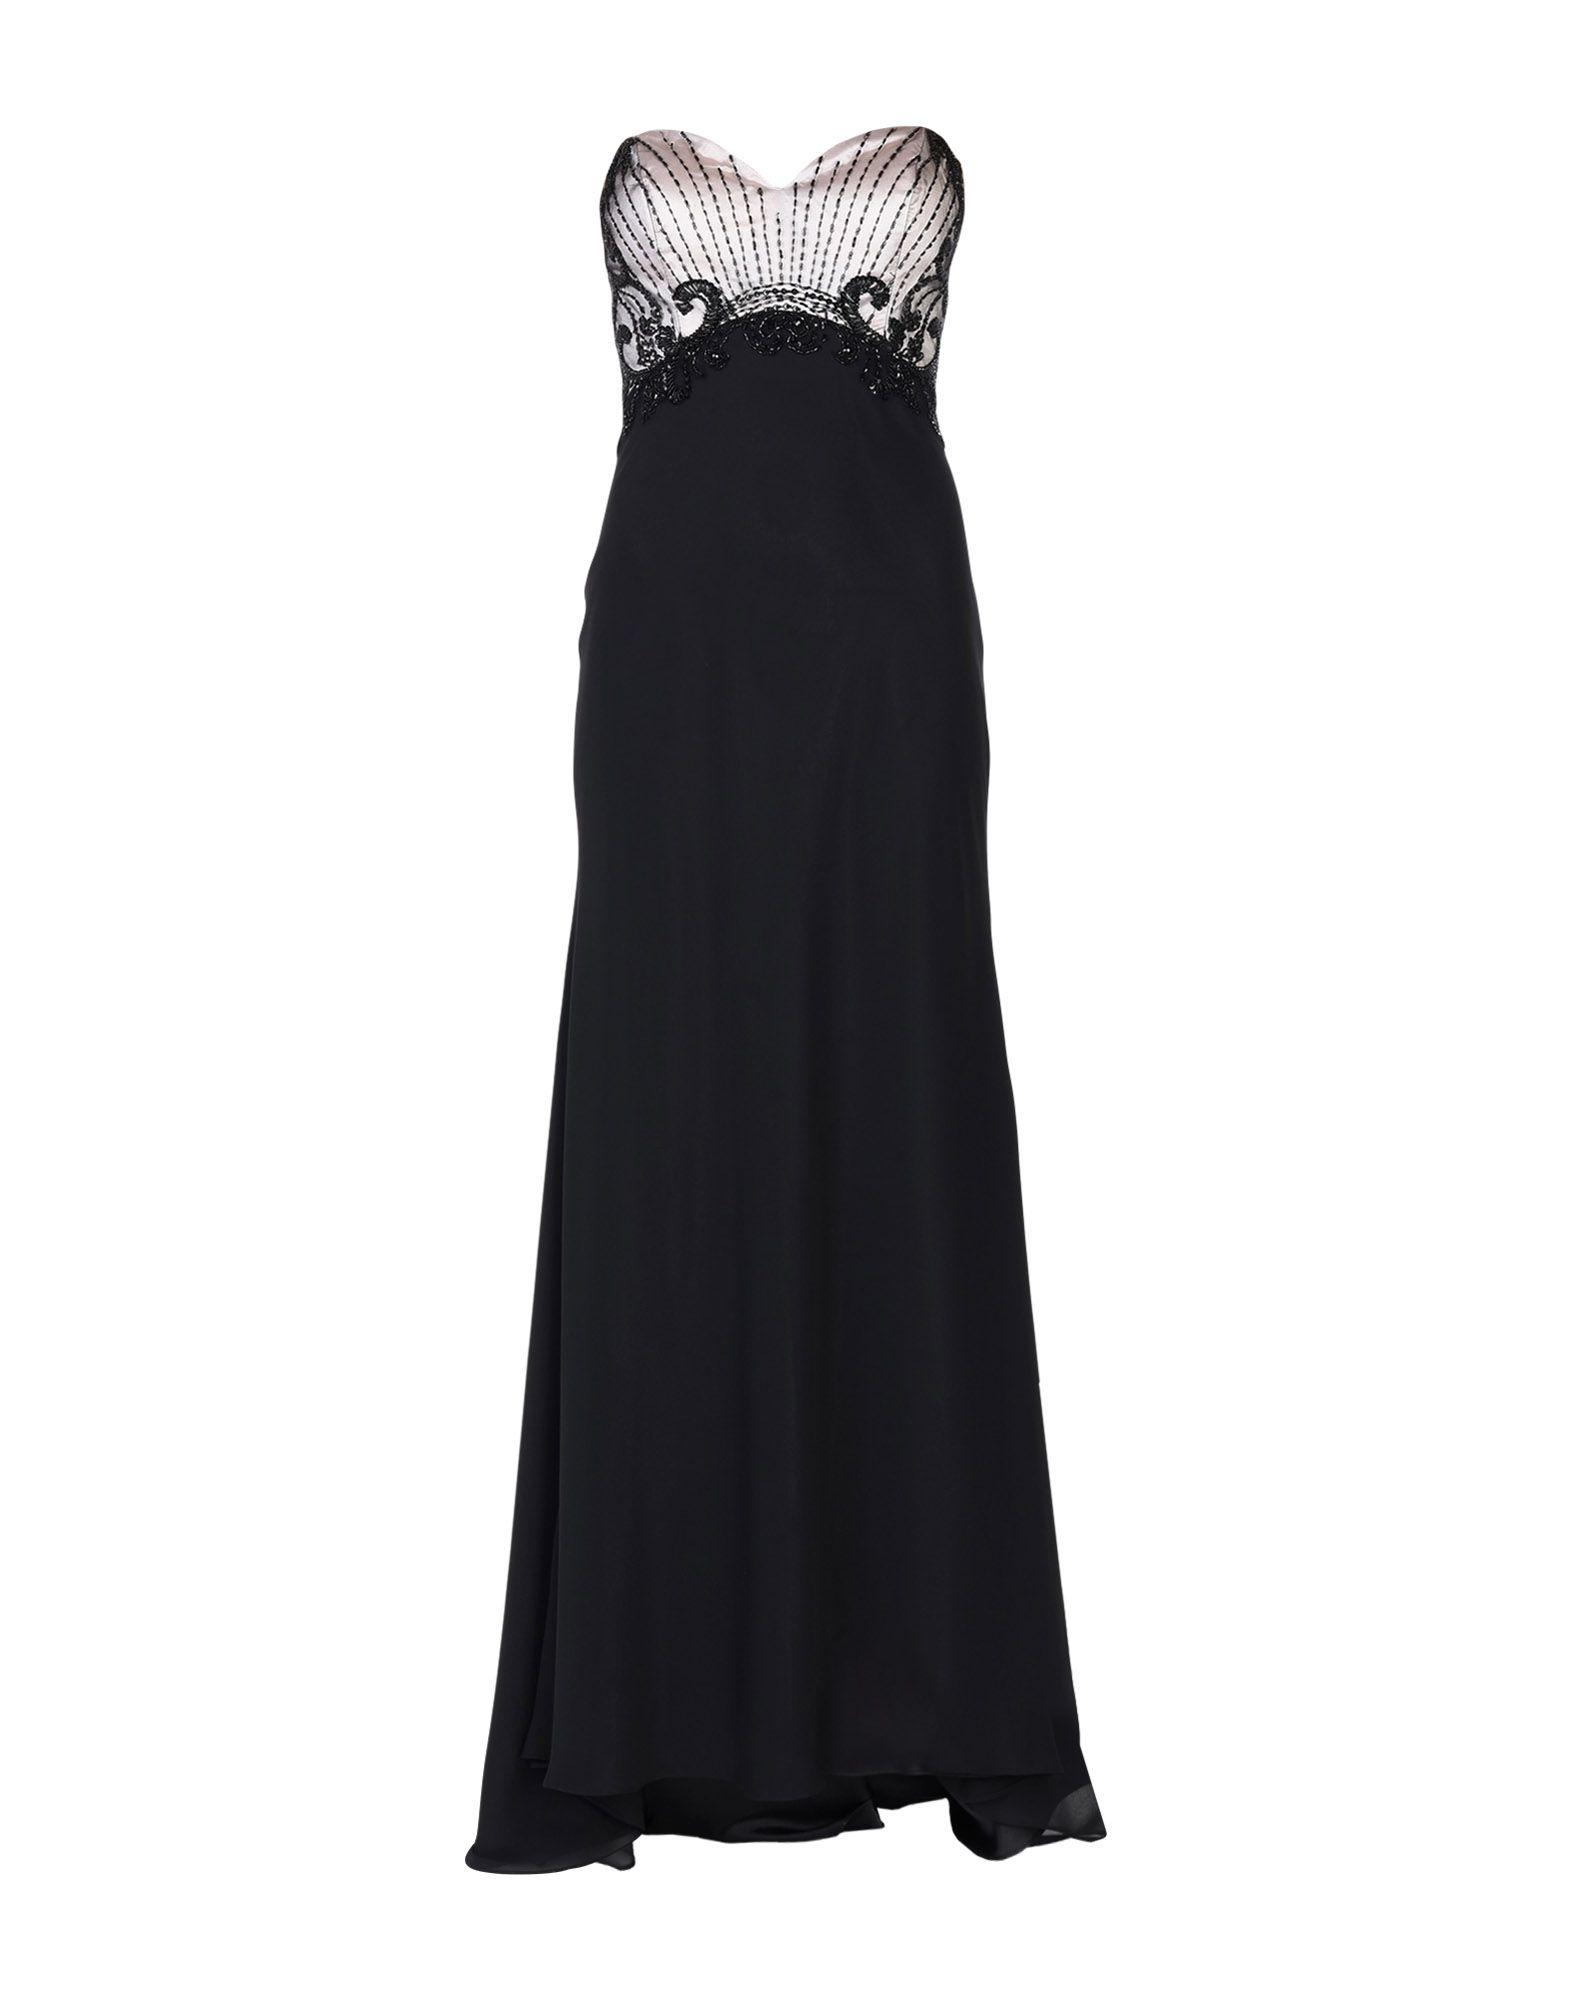 LADY CHIC® COLLECTION Длинное платье платье chic chic ch042ewtcv81 page 3